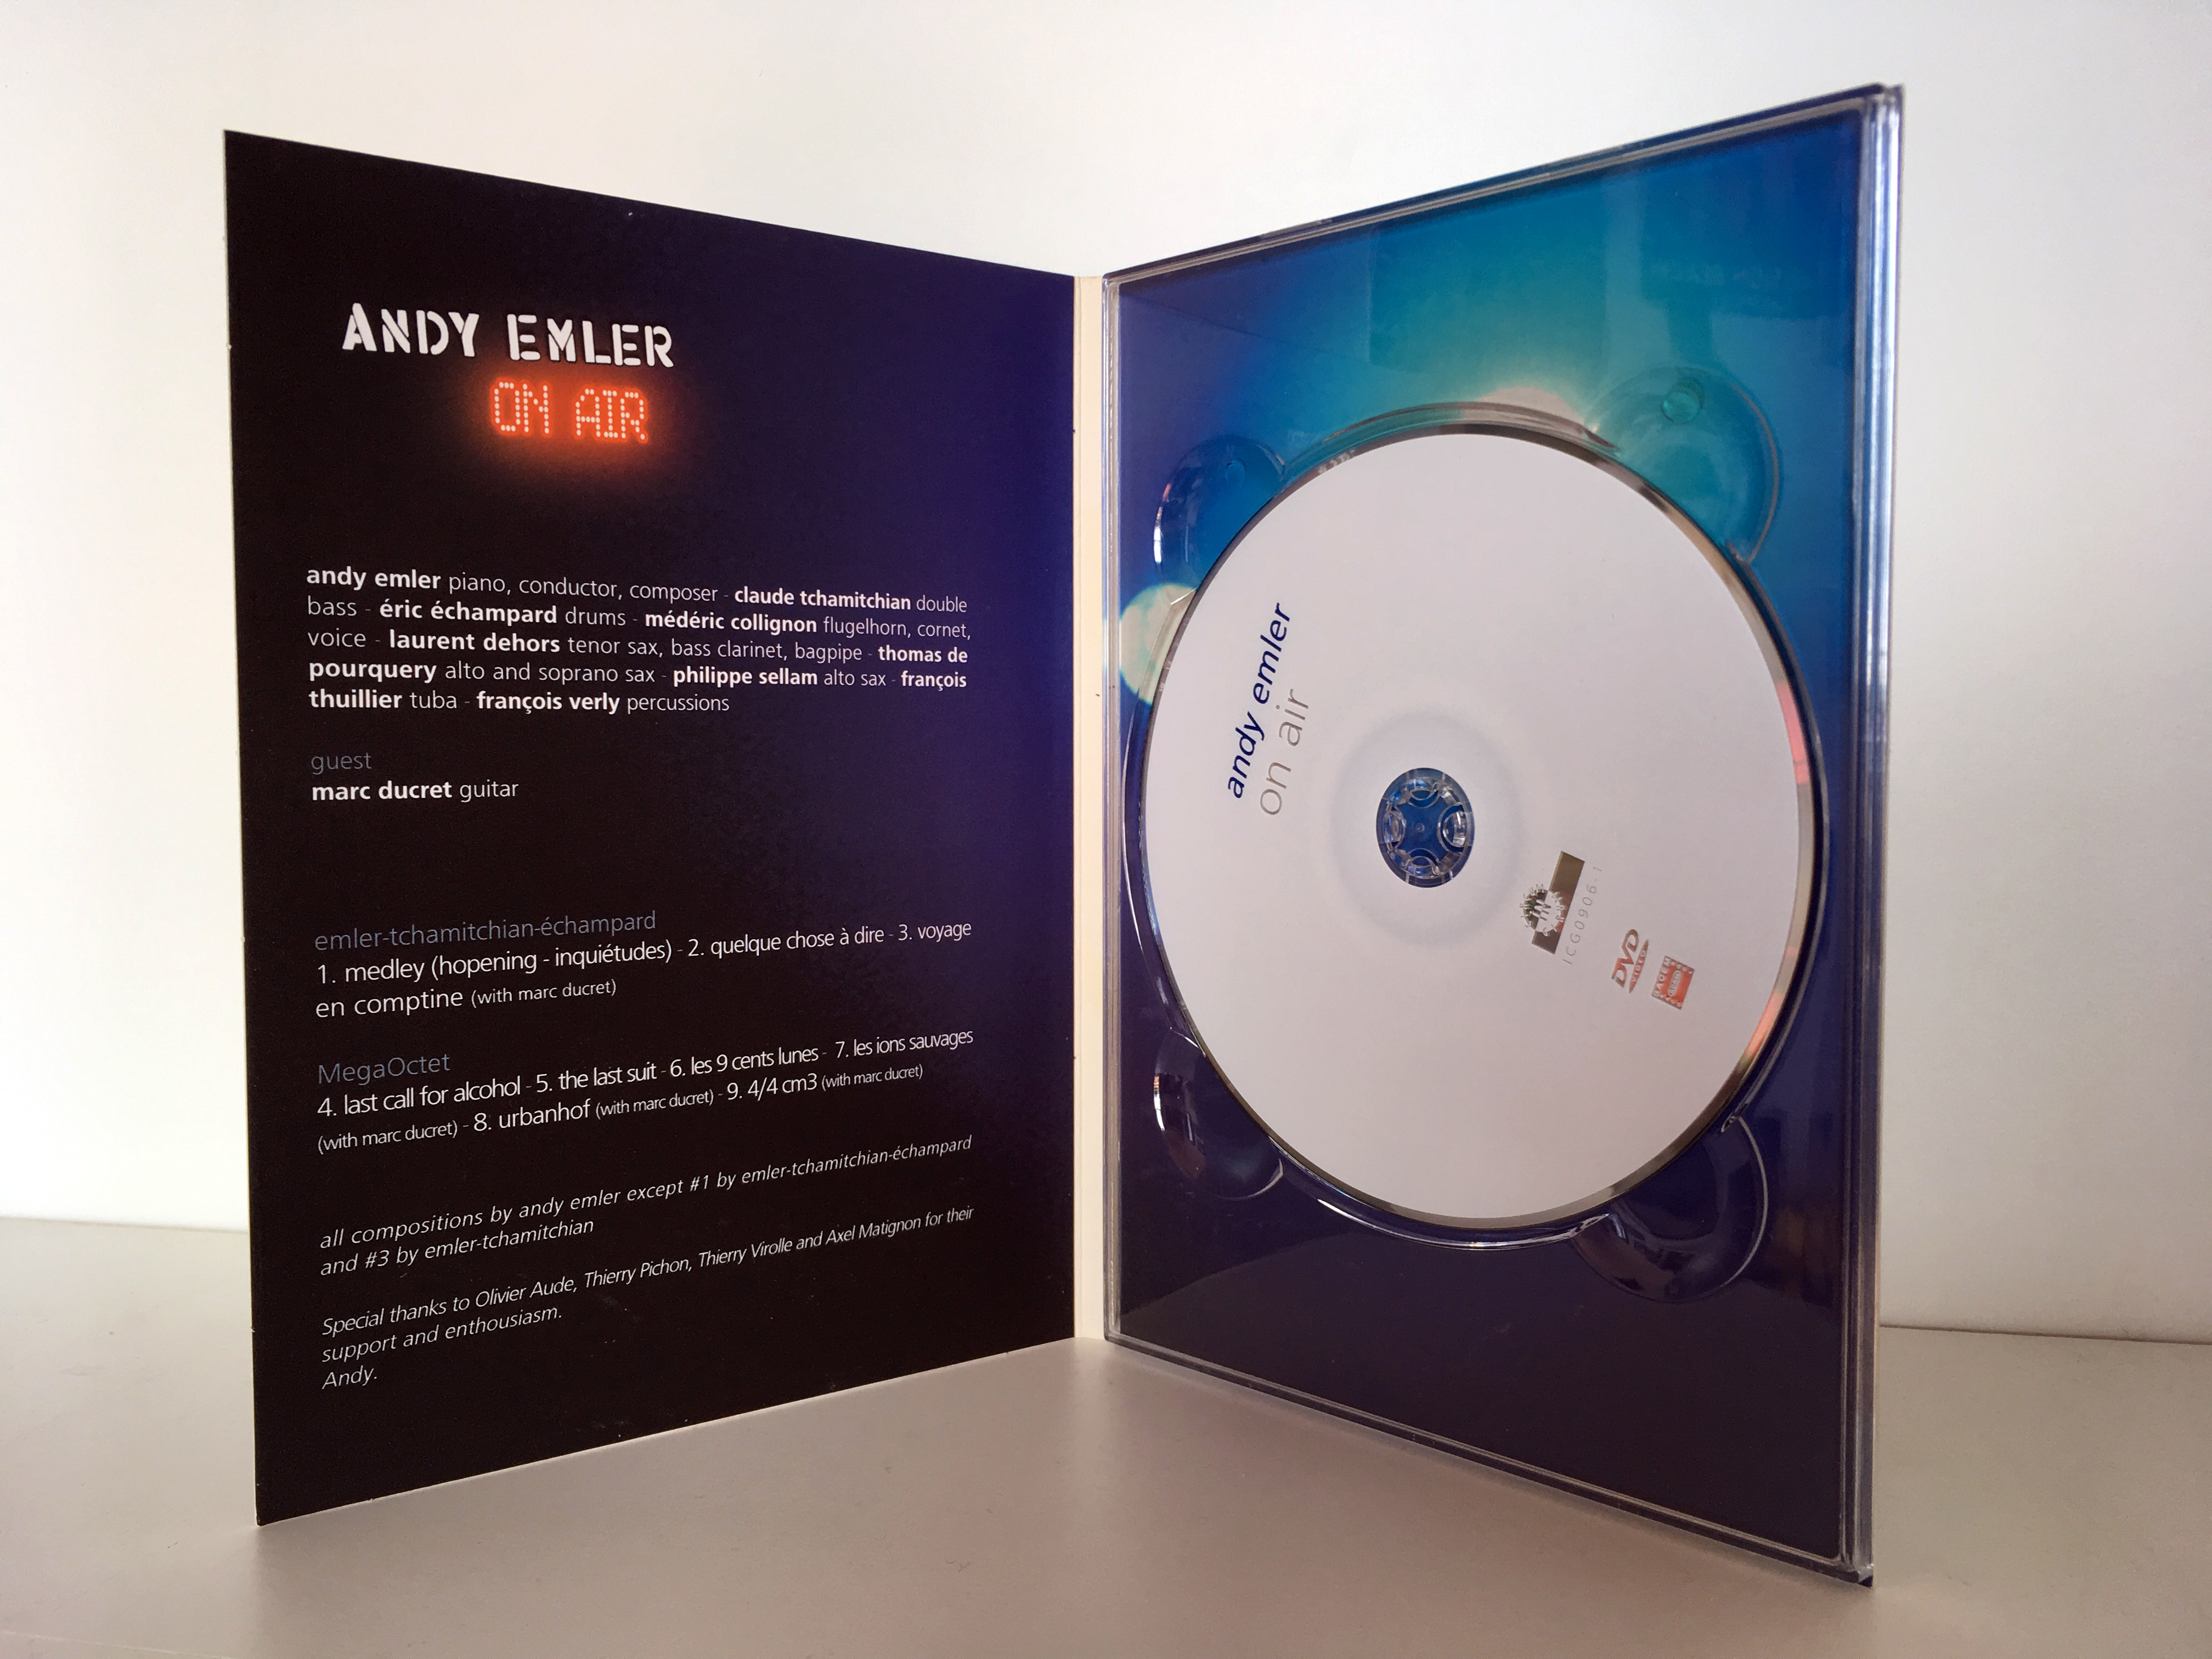 DVD ANDY EMLER - 2007